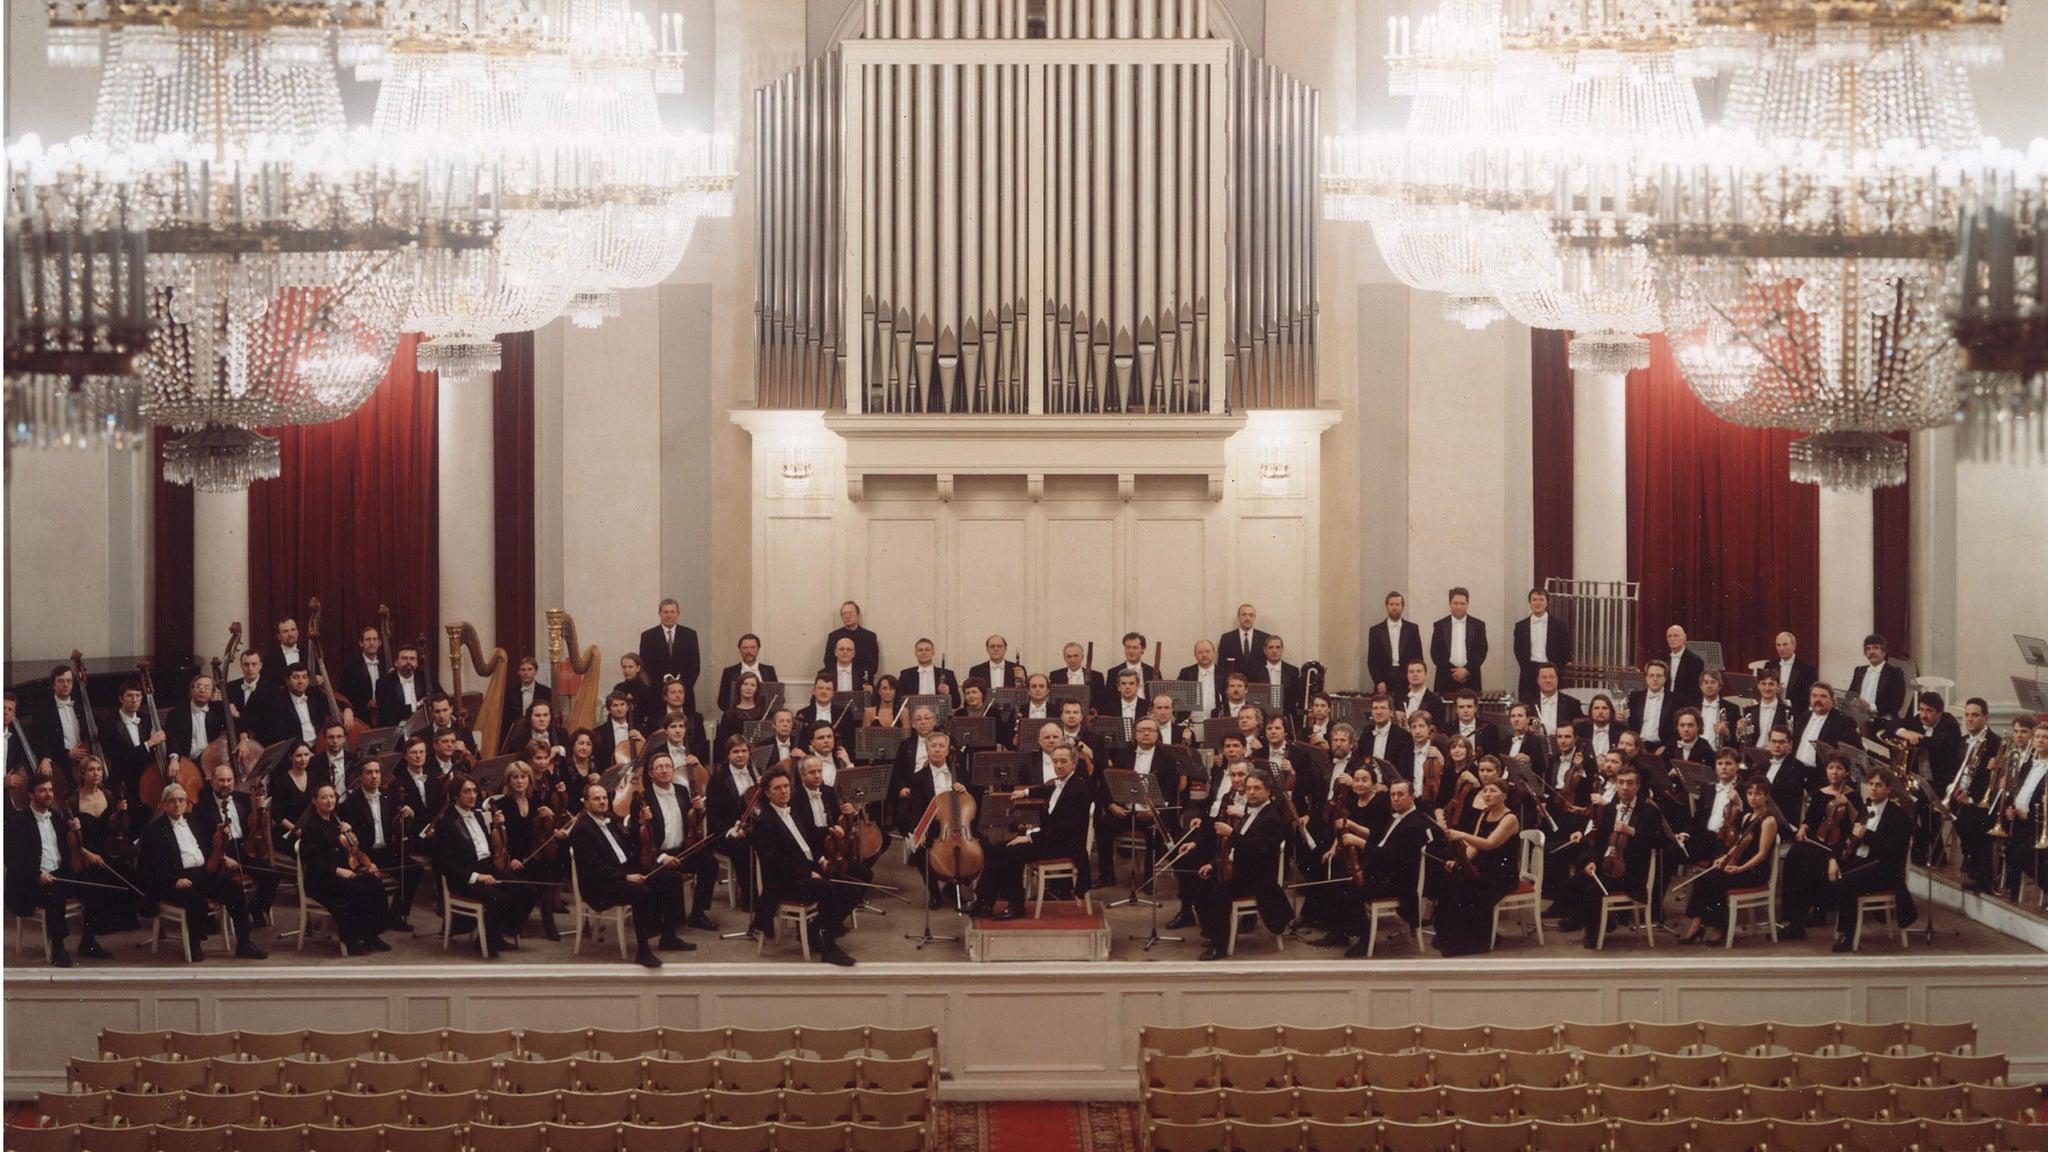 St. Petersburg Philharmonic Orchestra - Northridge, CA 91330